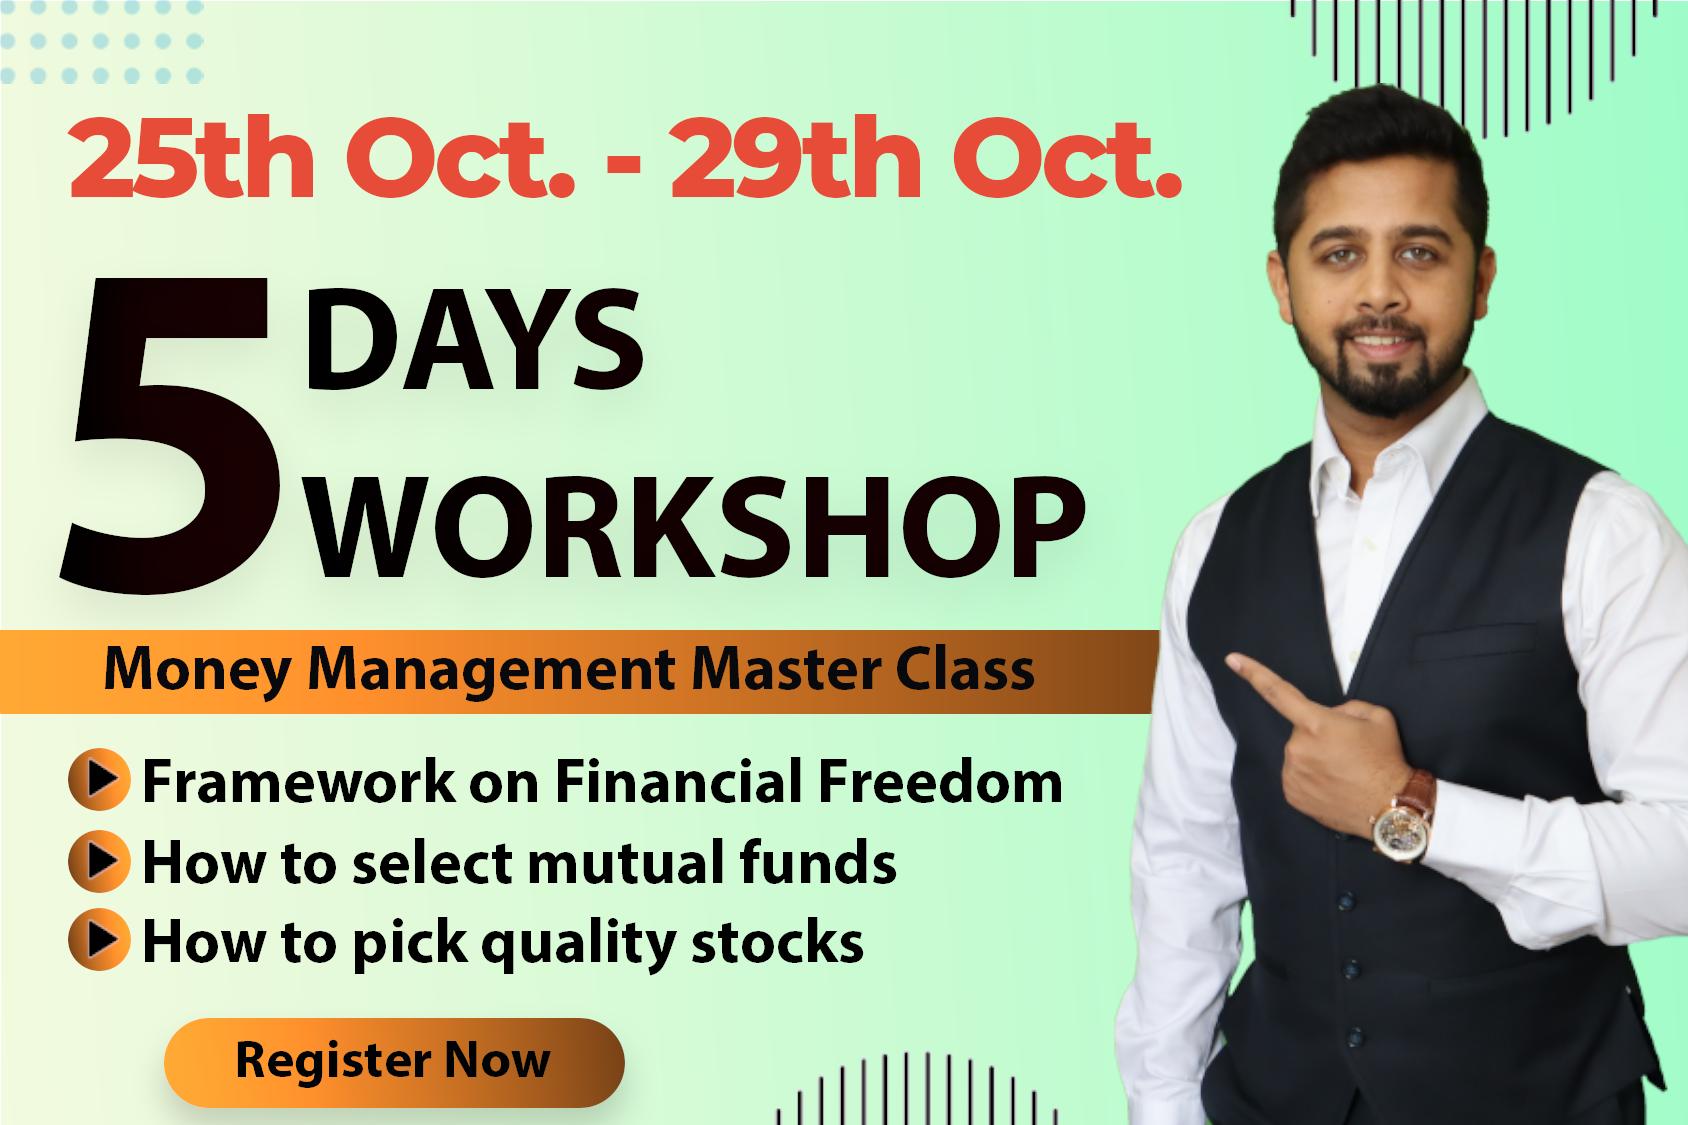 Batch 1: 5 Day Money Management Masterclass cover